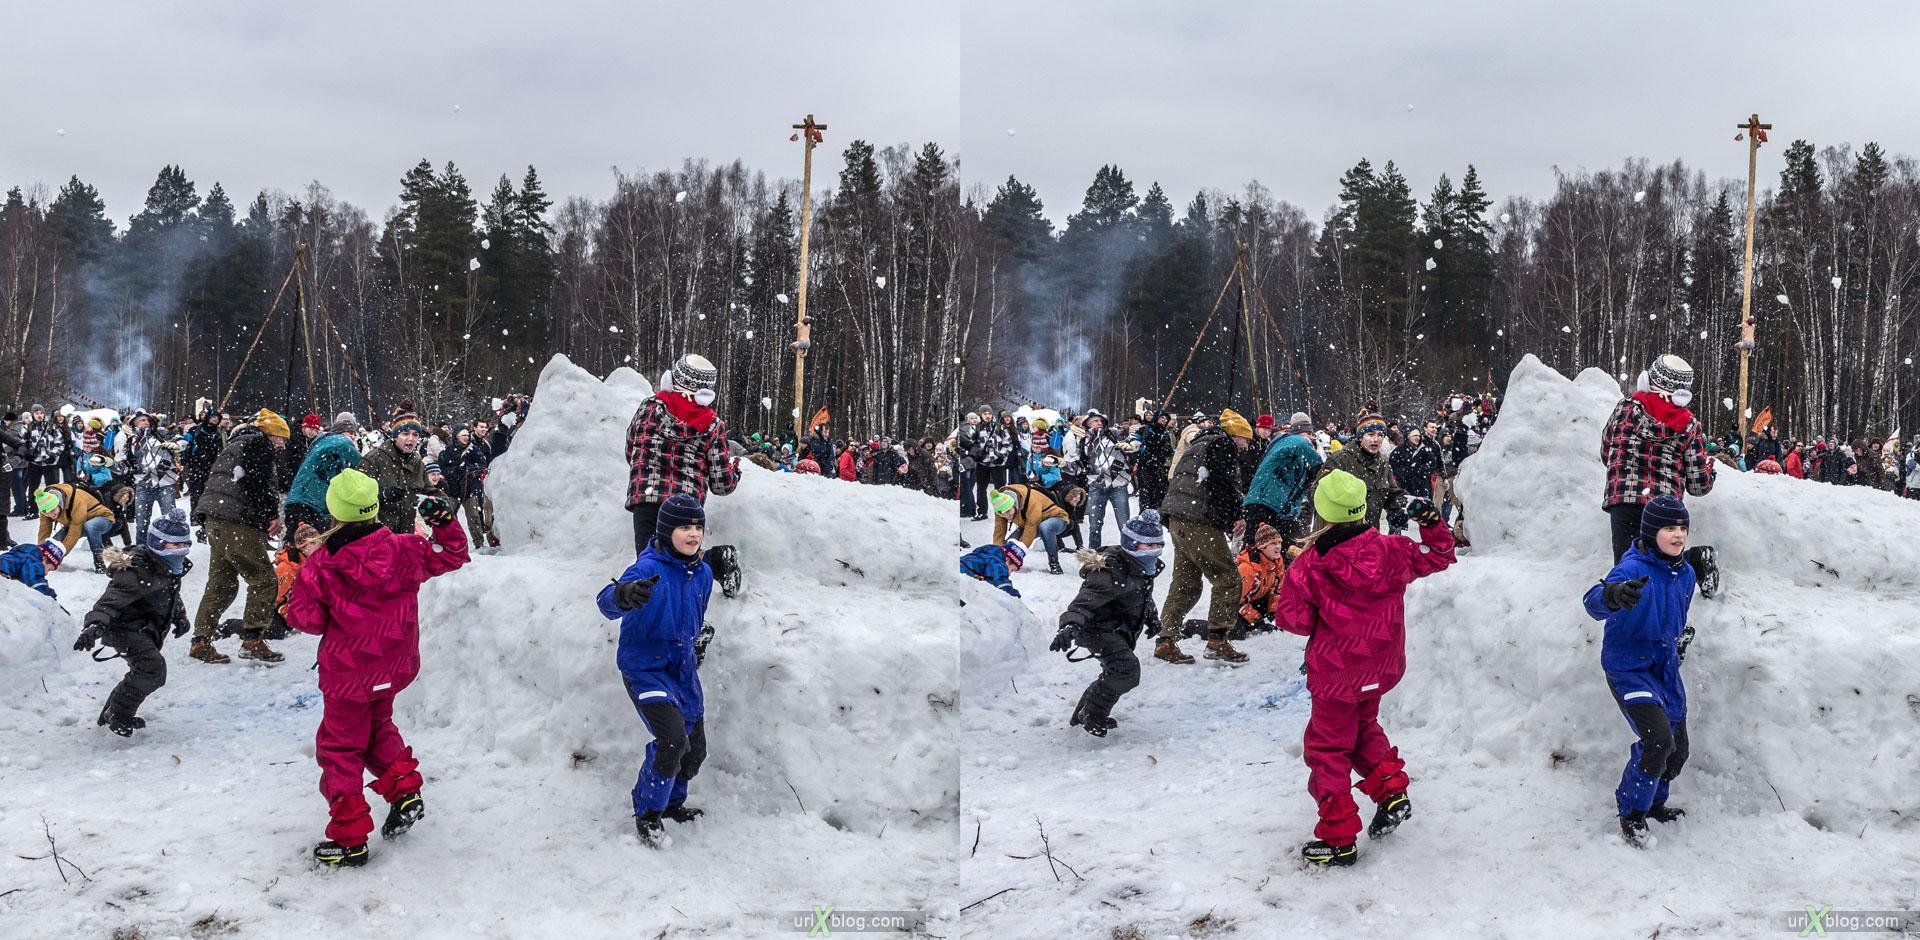 Bakshevskaja Maslenitsa, snowballs, fight, Khlyupino railway station, Moscow, Russia, 3D, stereo pair, cross-eyed, crossview, cross view stereo pair, stereoscopic, 2015